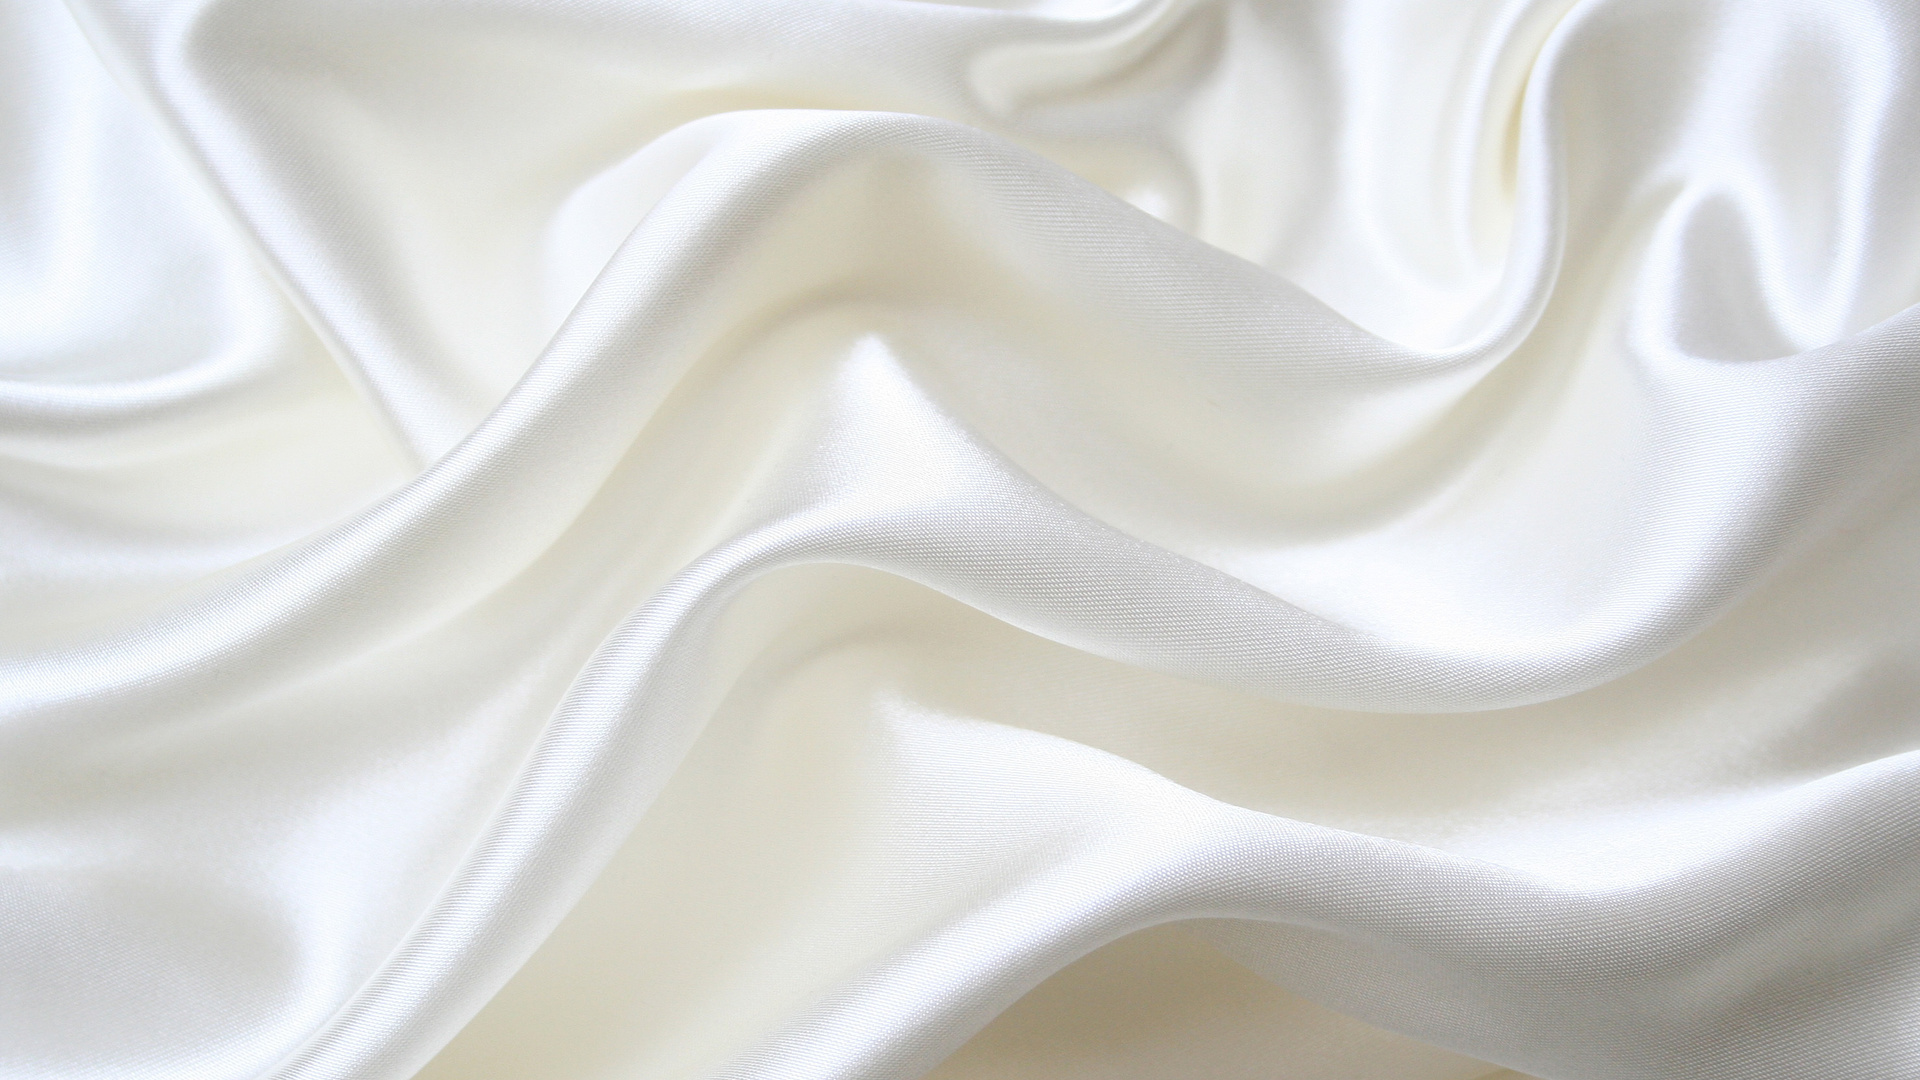 фото на фоне белой ткани рухнул воду, удара